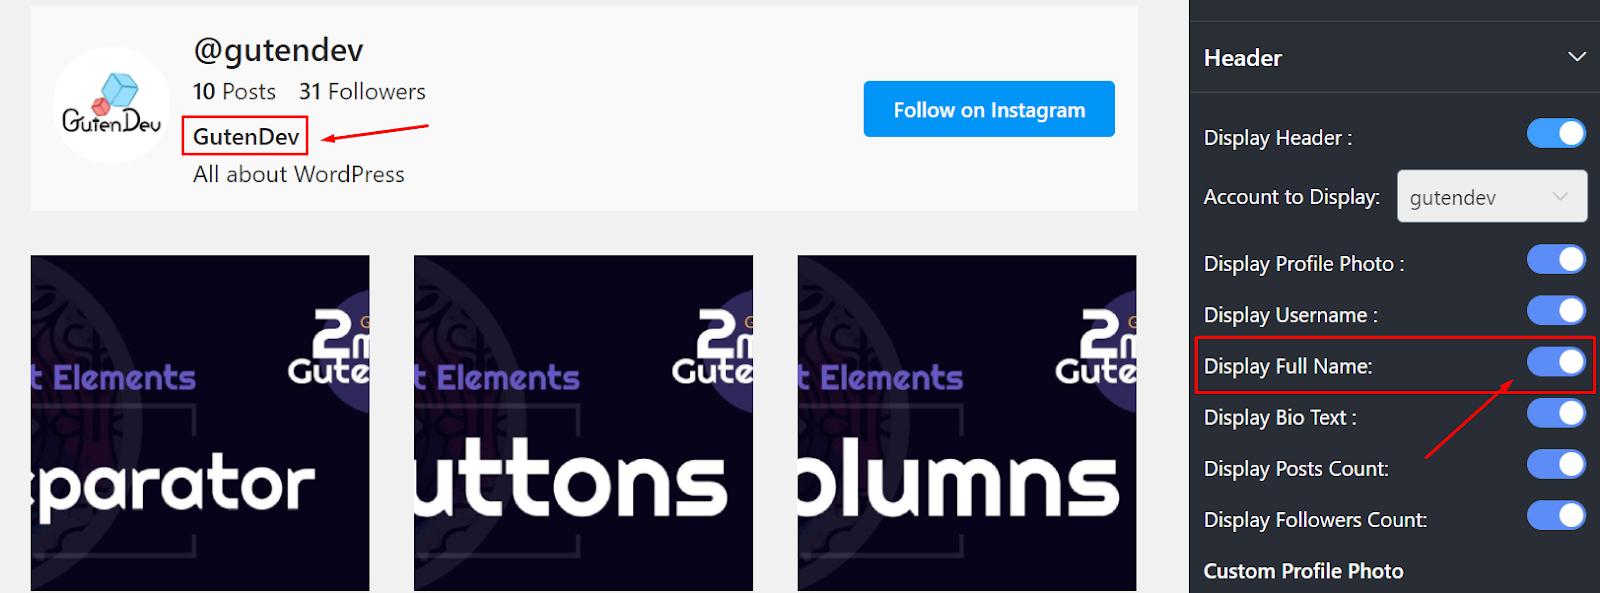 Instagram display full name